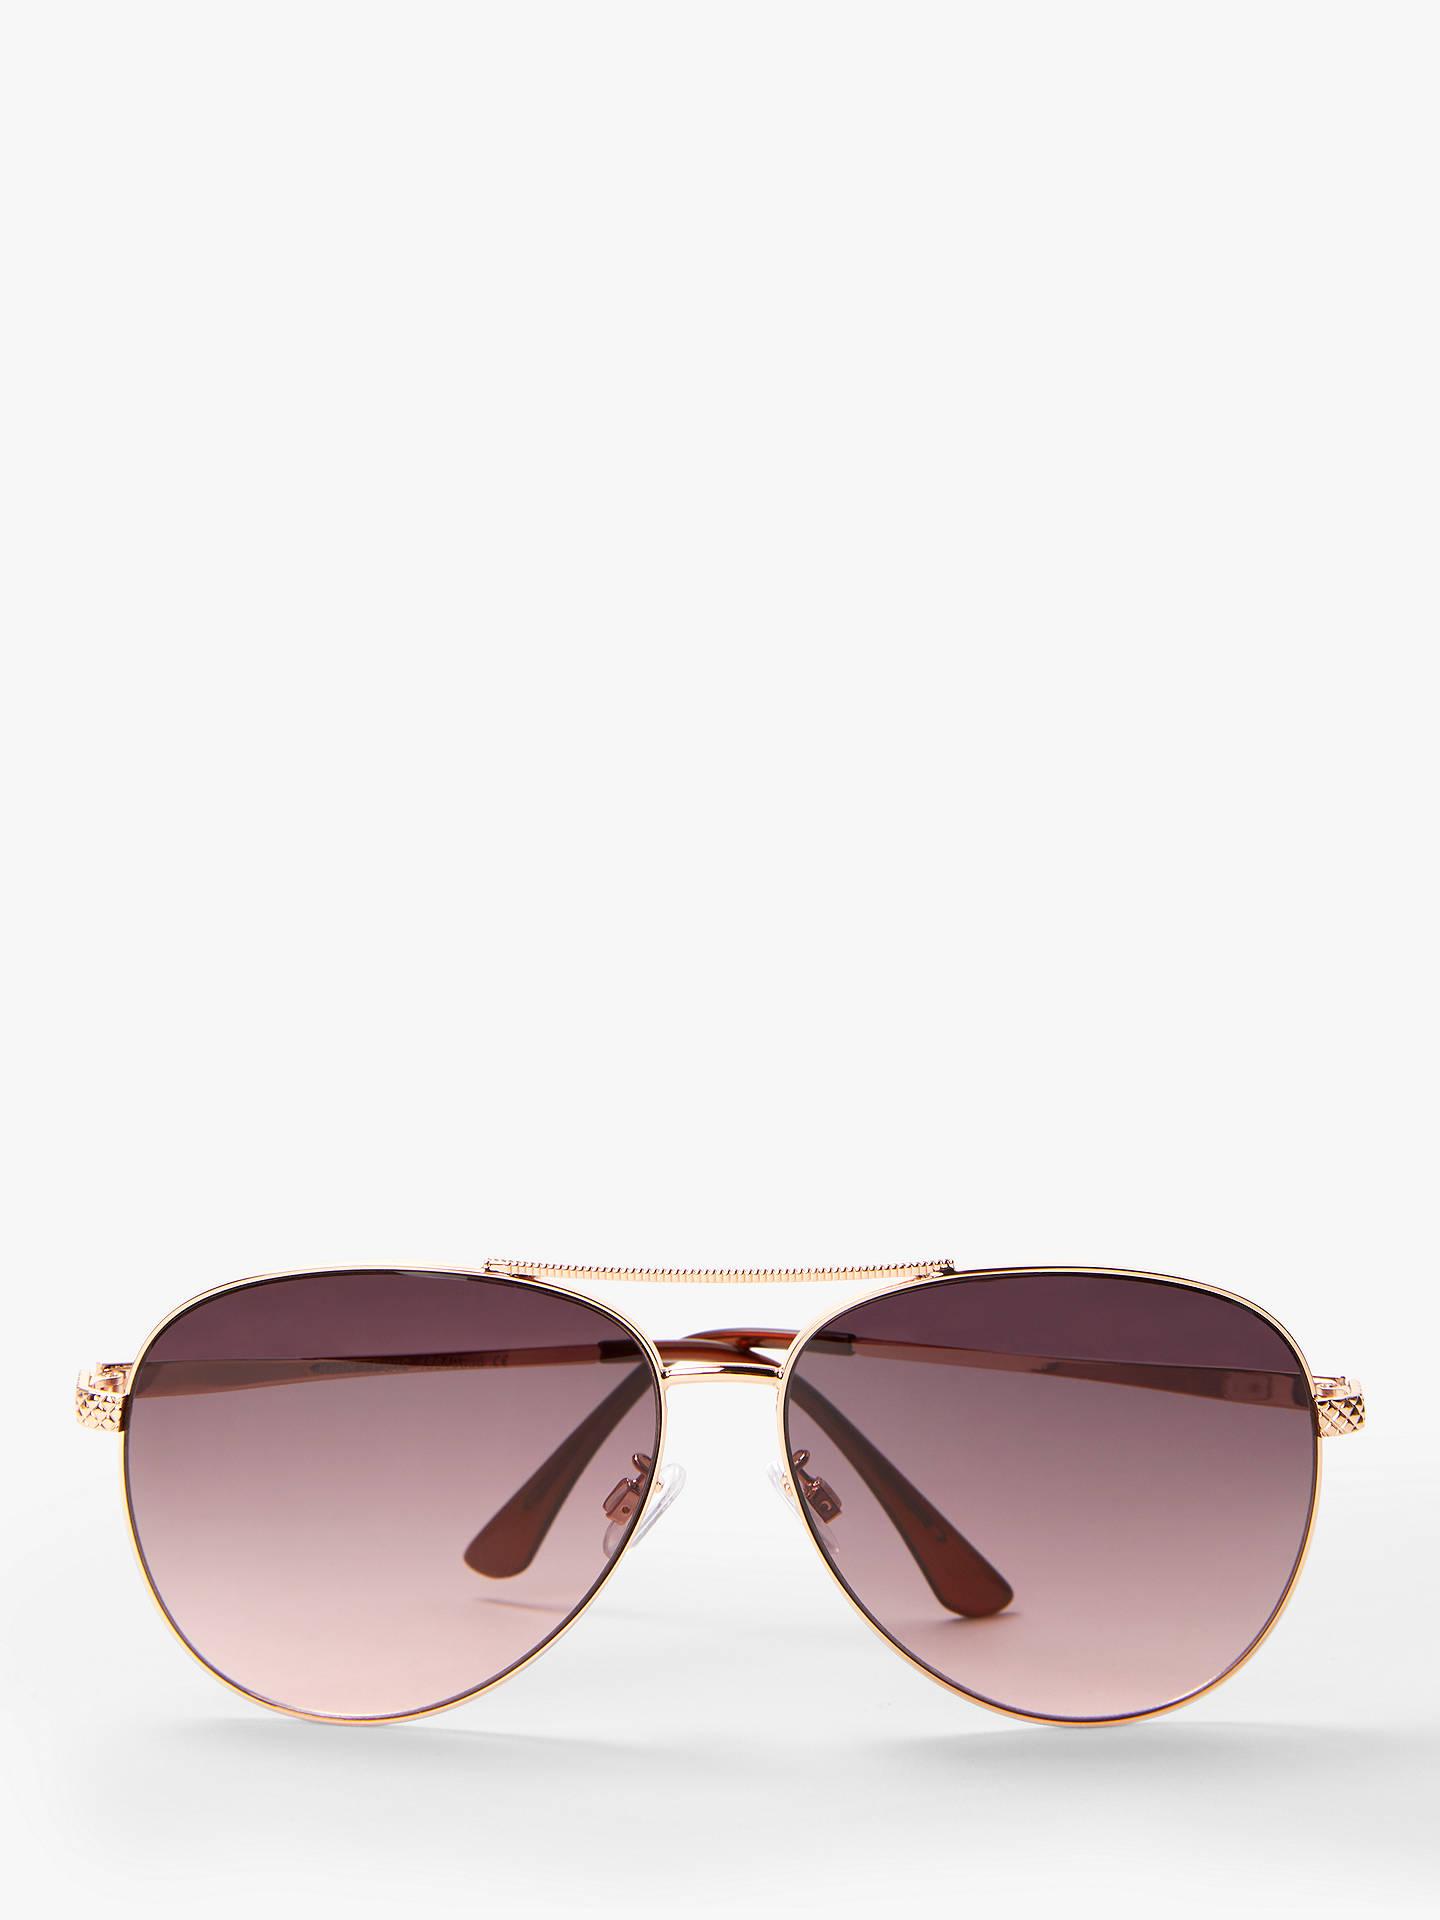 0868e2d36f5 Buy John Lewis & Partners Women's Twist Aviator Sunglasses, Rose Gold/Purple  Gradient Online ...